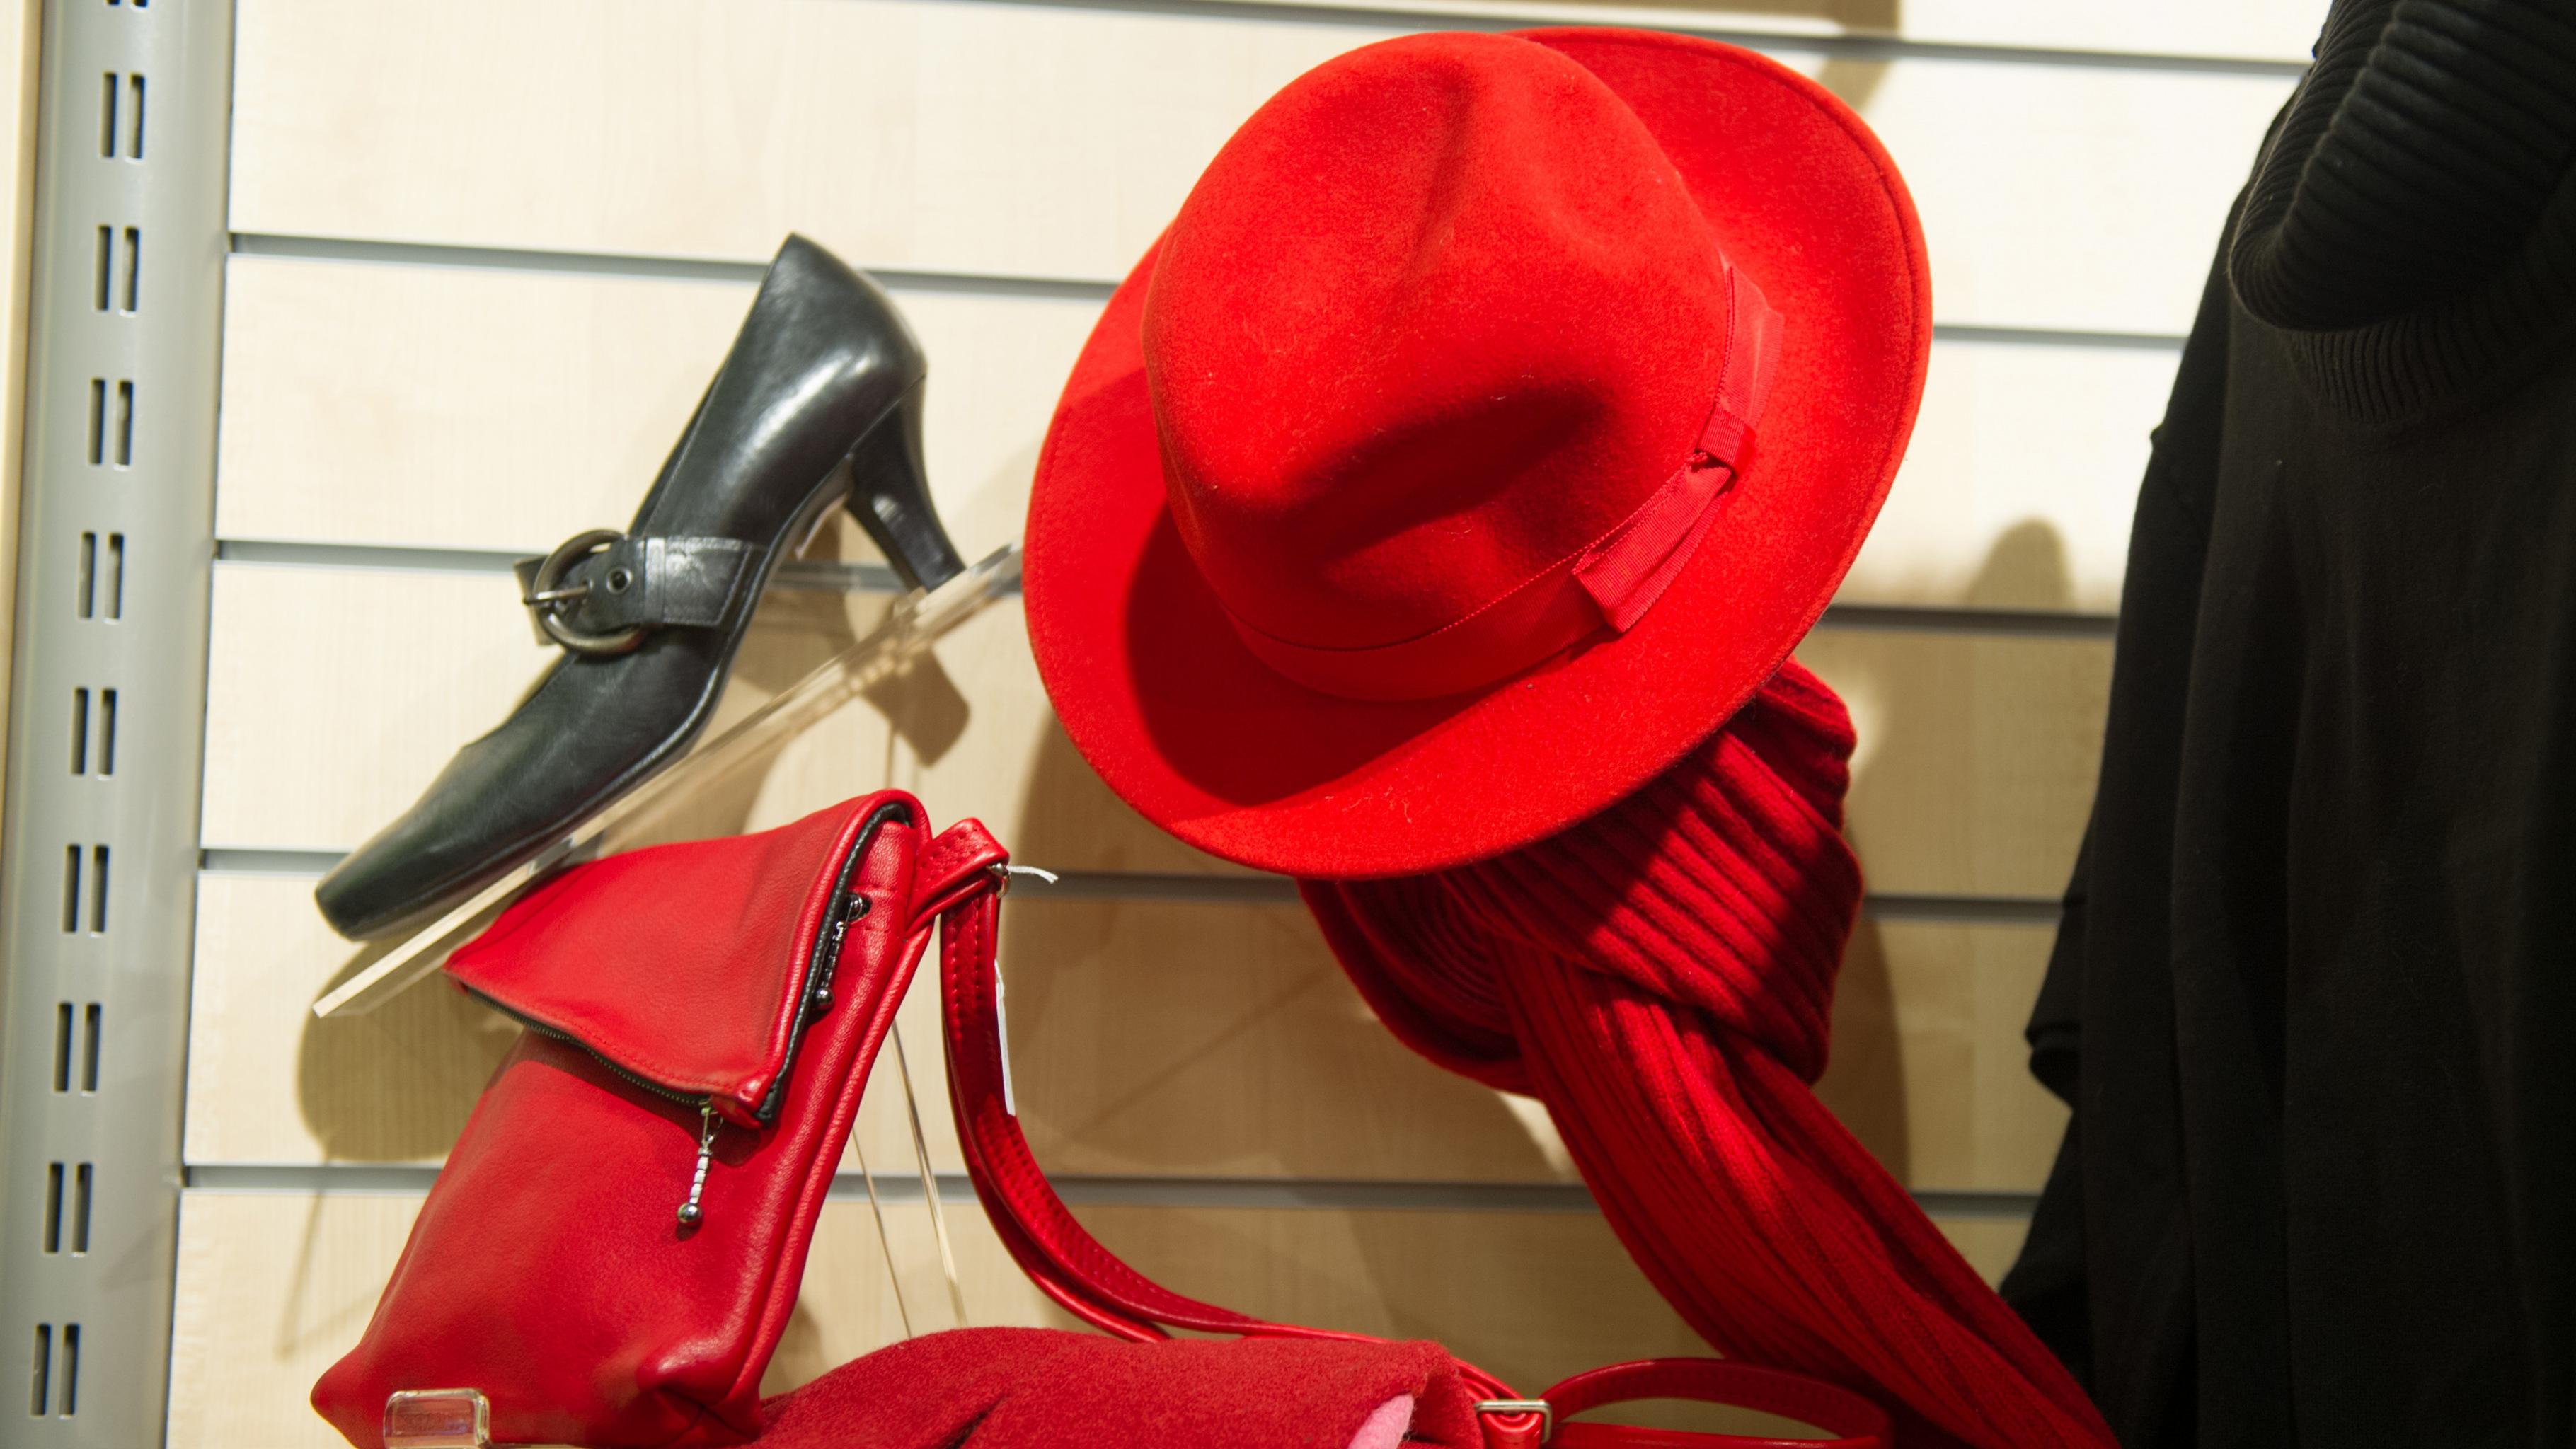 Oxfam Fashionshop Ulm - Accessoires